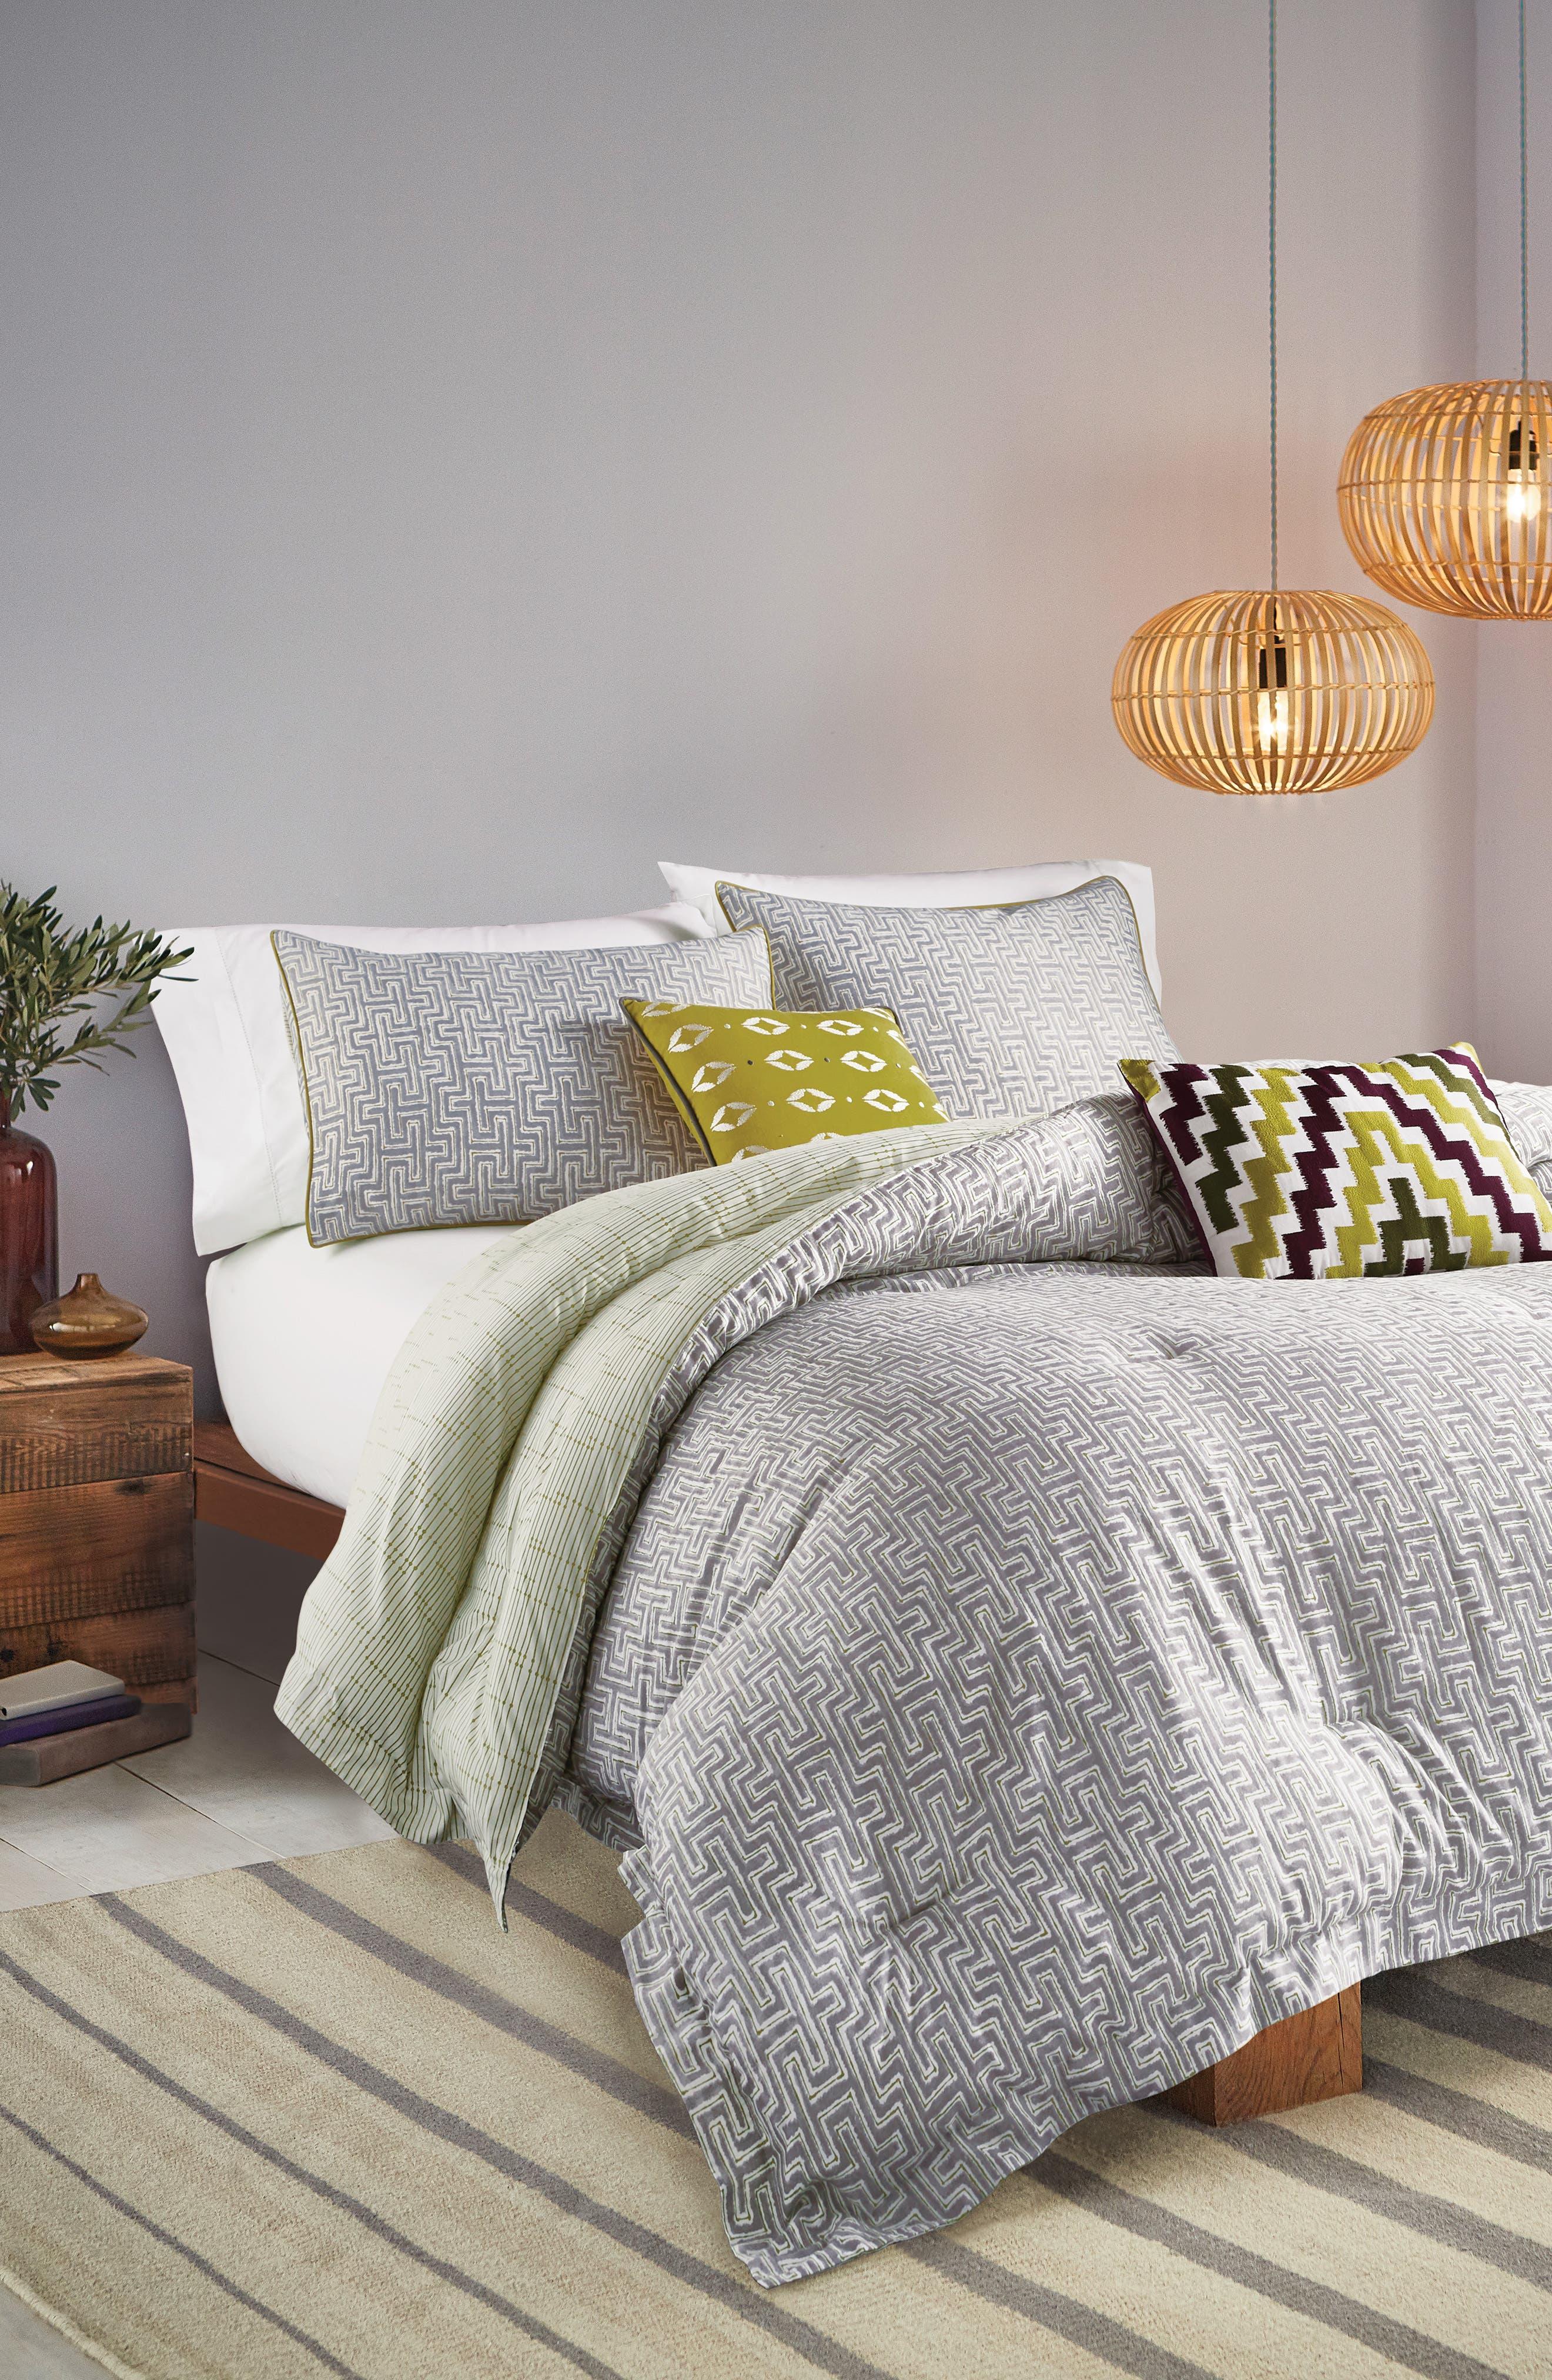 BEDECK,                             Koba Comforter, Sham & Accent Pillow Set,                             Main thumbnail 1, color,                             LIGHT GREY